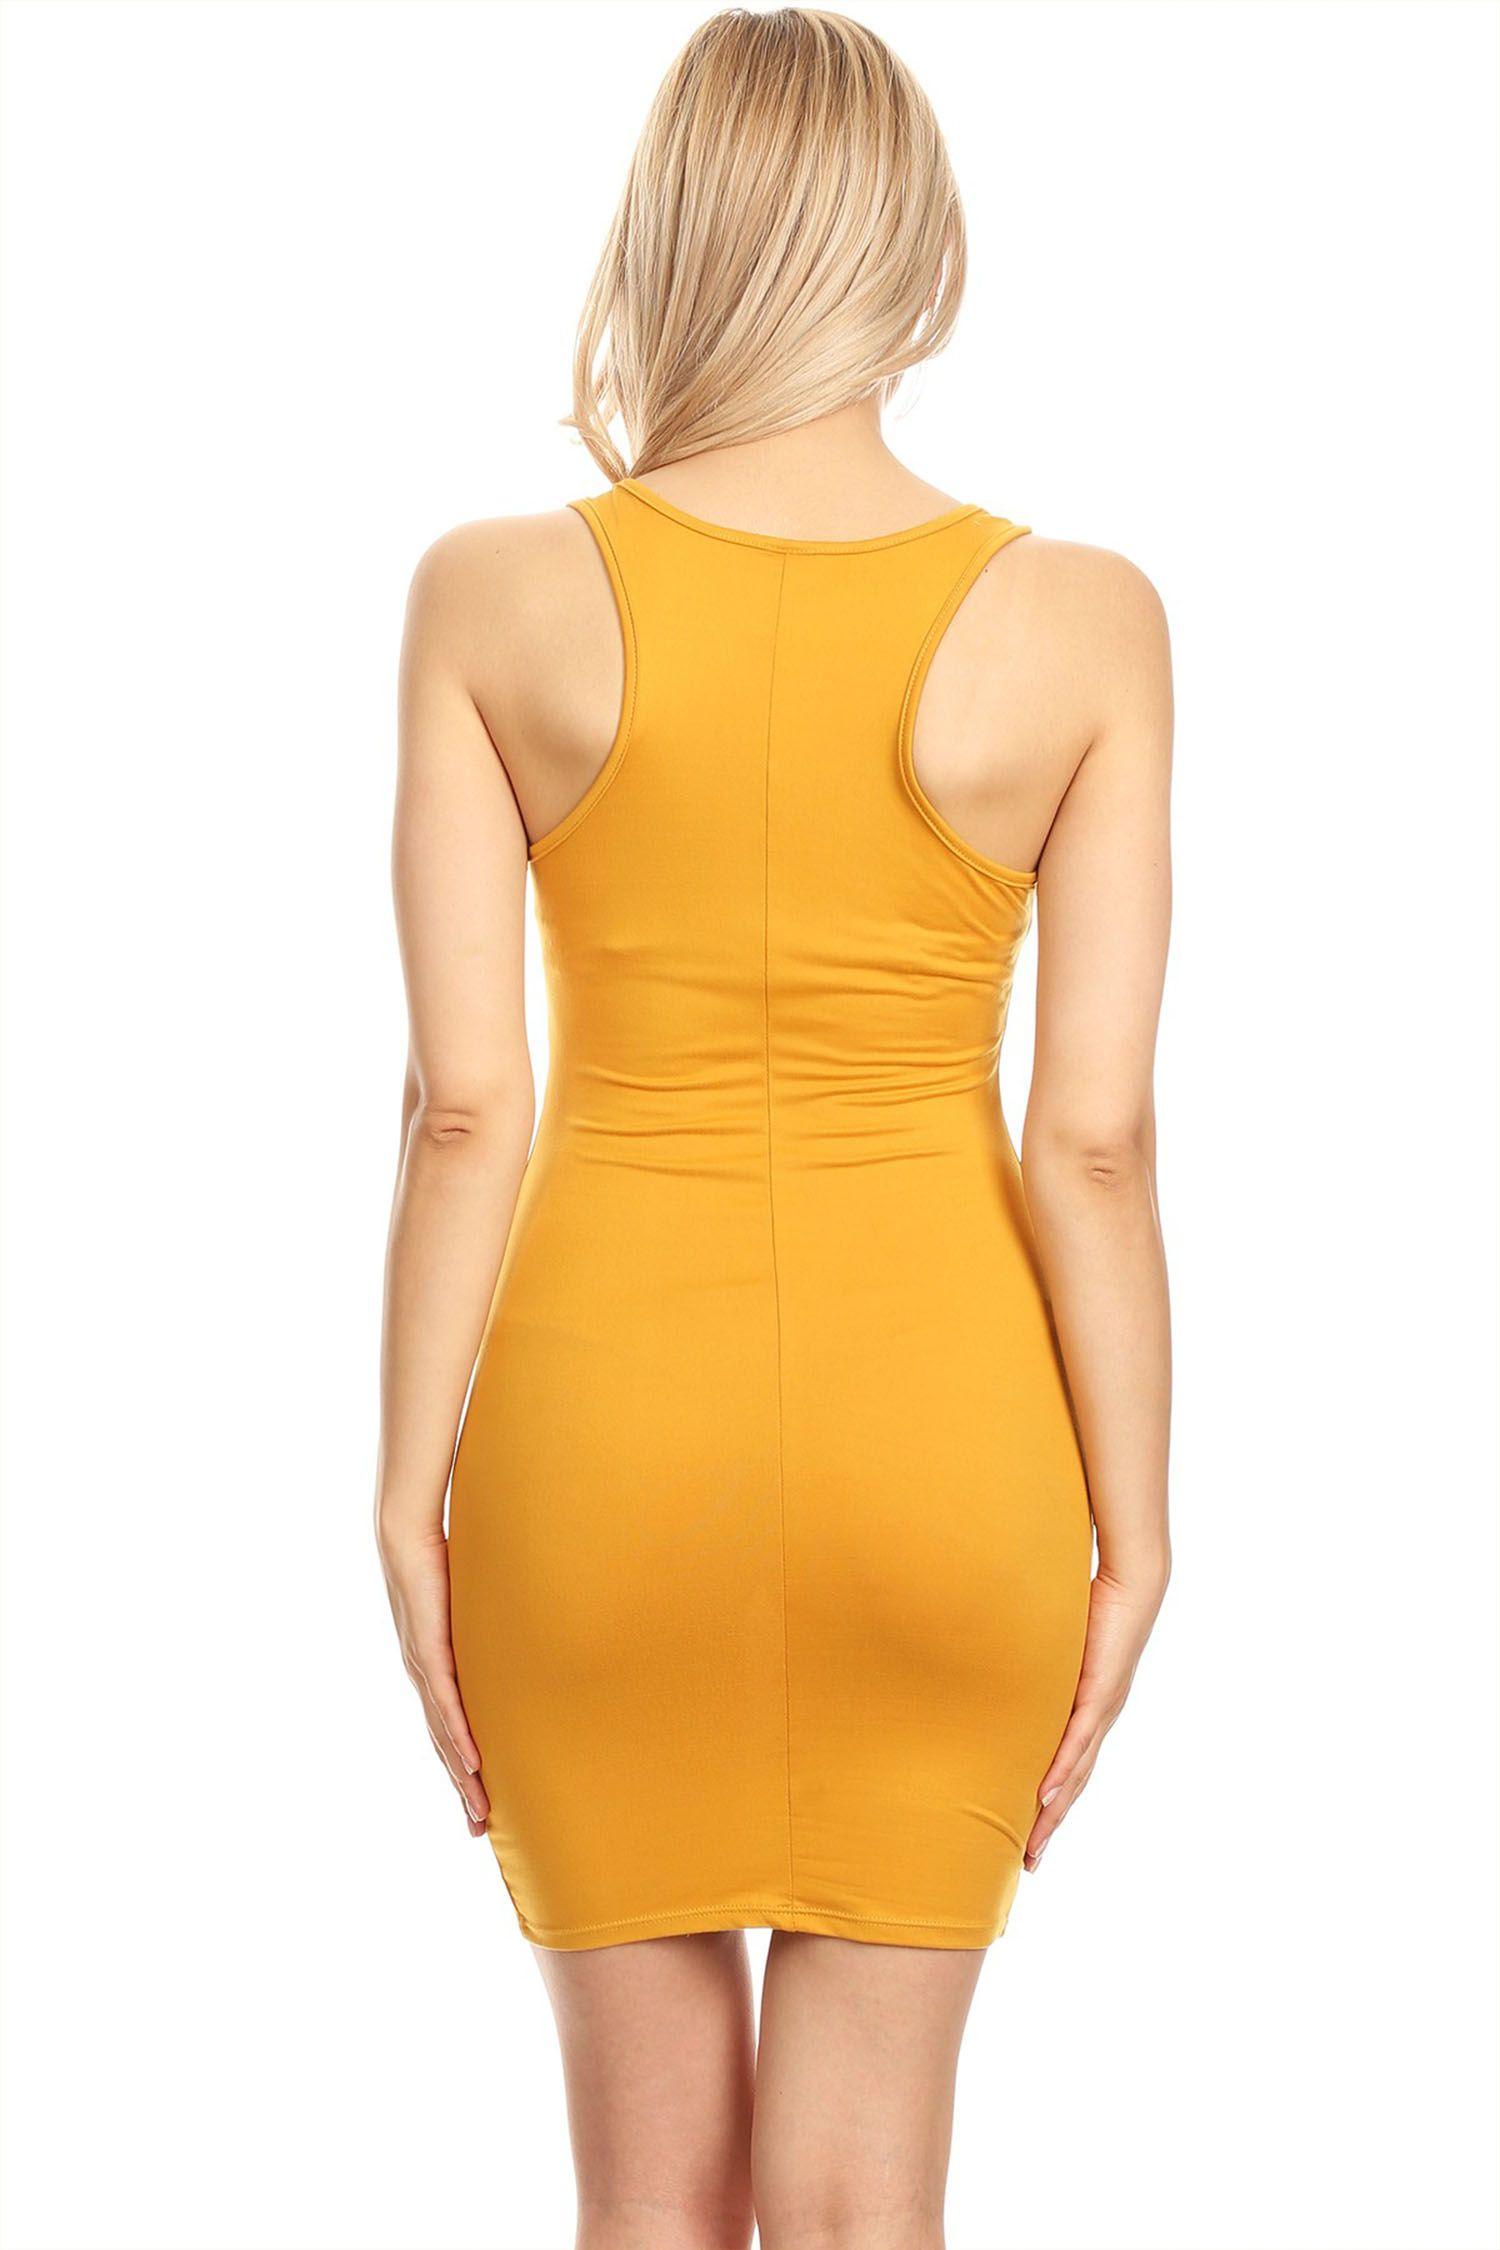 Moa Collection Women S Solid Color Racerback Tank Style Bodycon Dress Walmart Com Bodycon Dress Dresses Racerback Tank Dress [ 2250 x 1500 Pixel ]